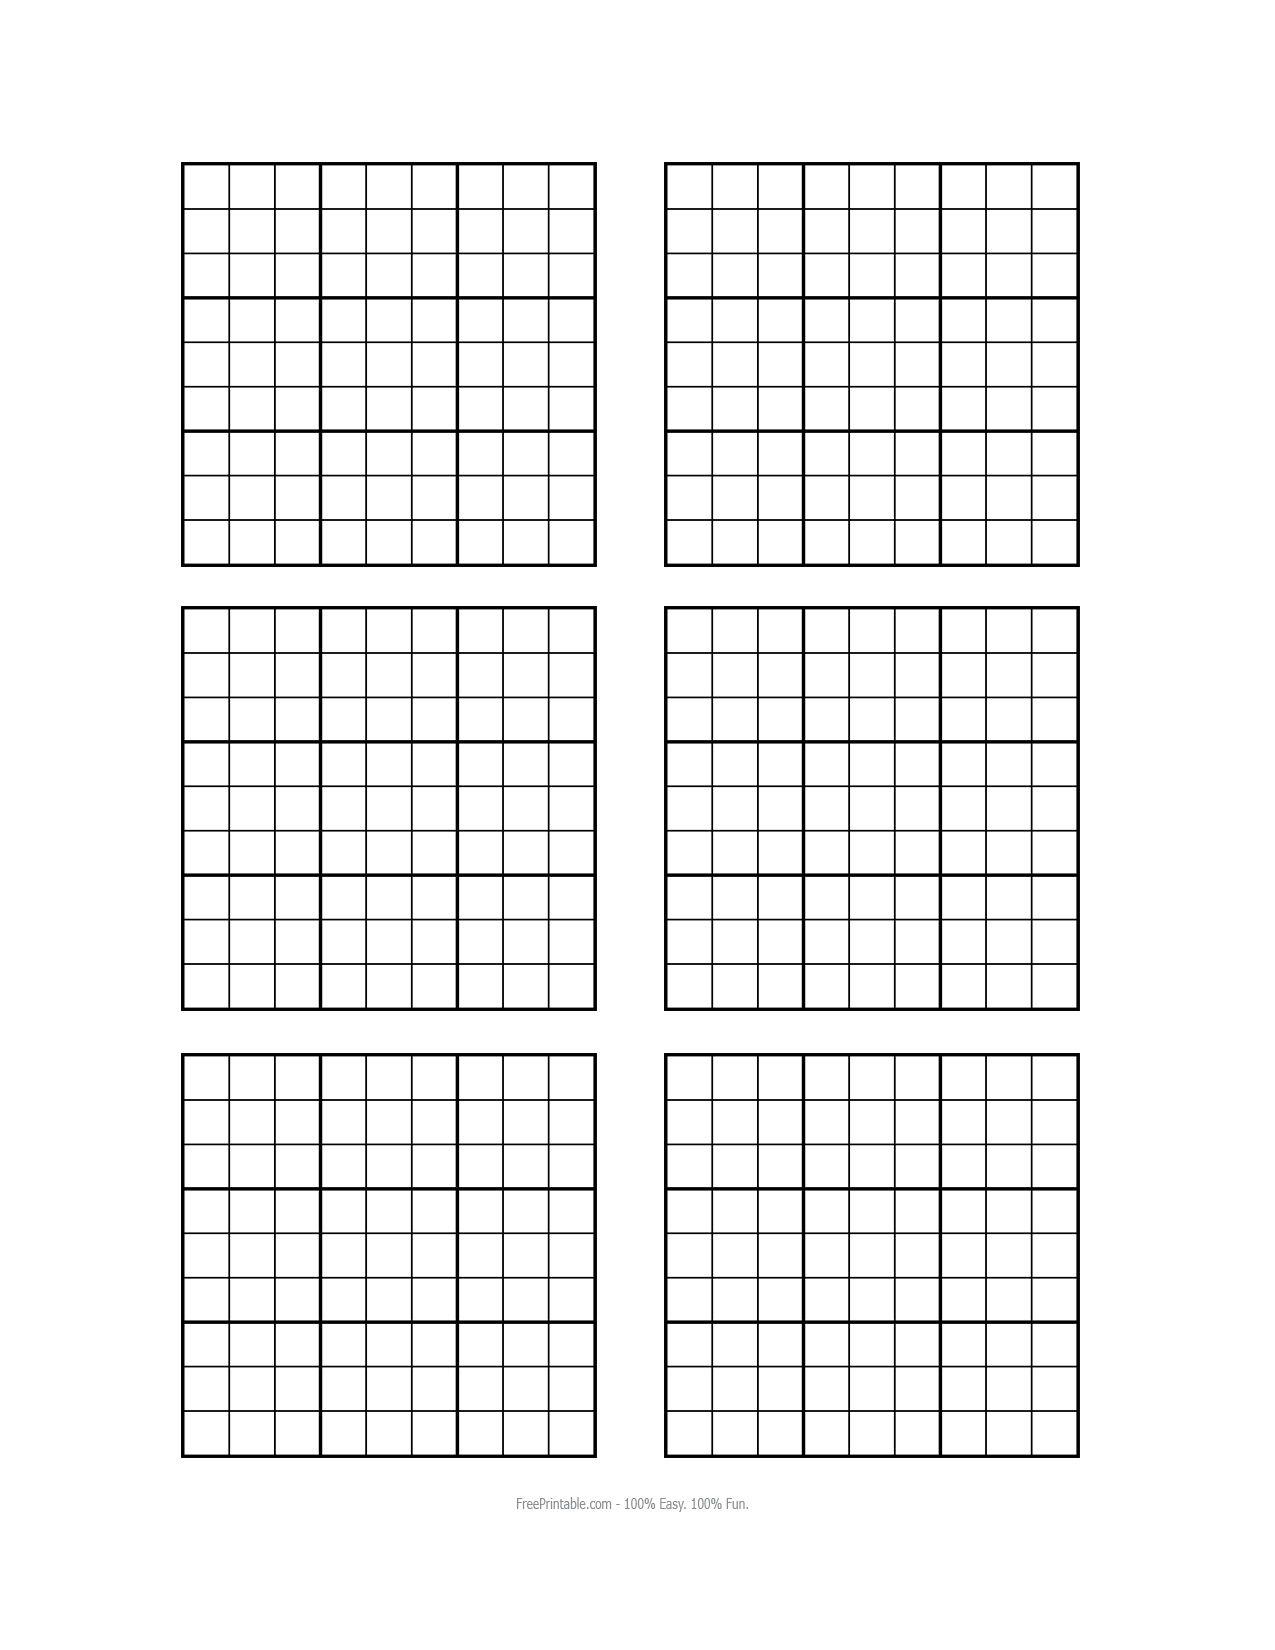 Free Printable Blank Sudoku Sheets